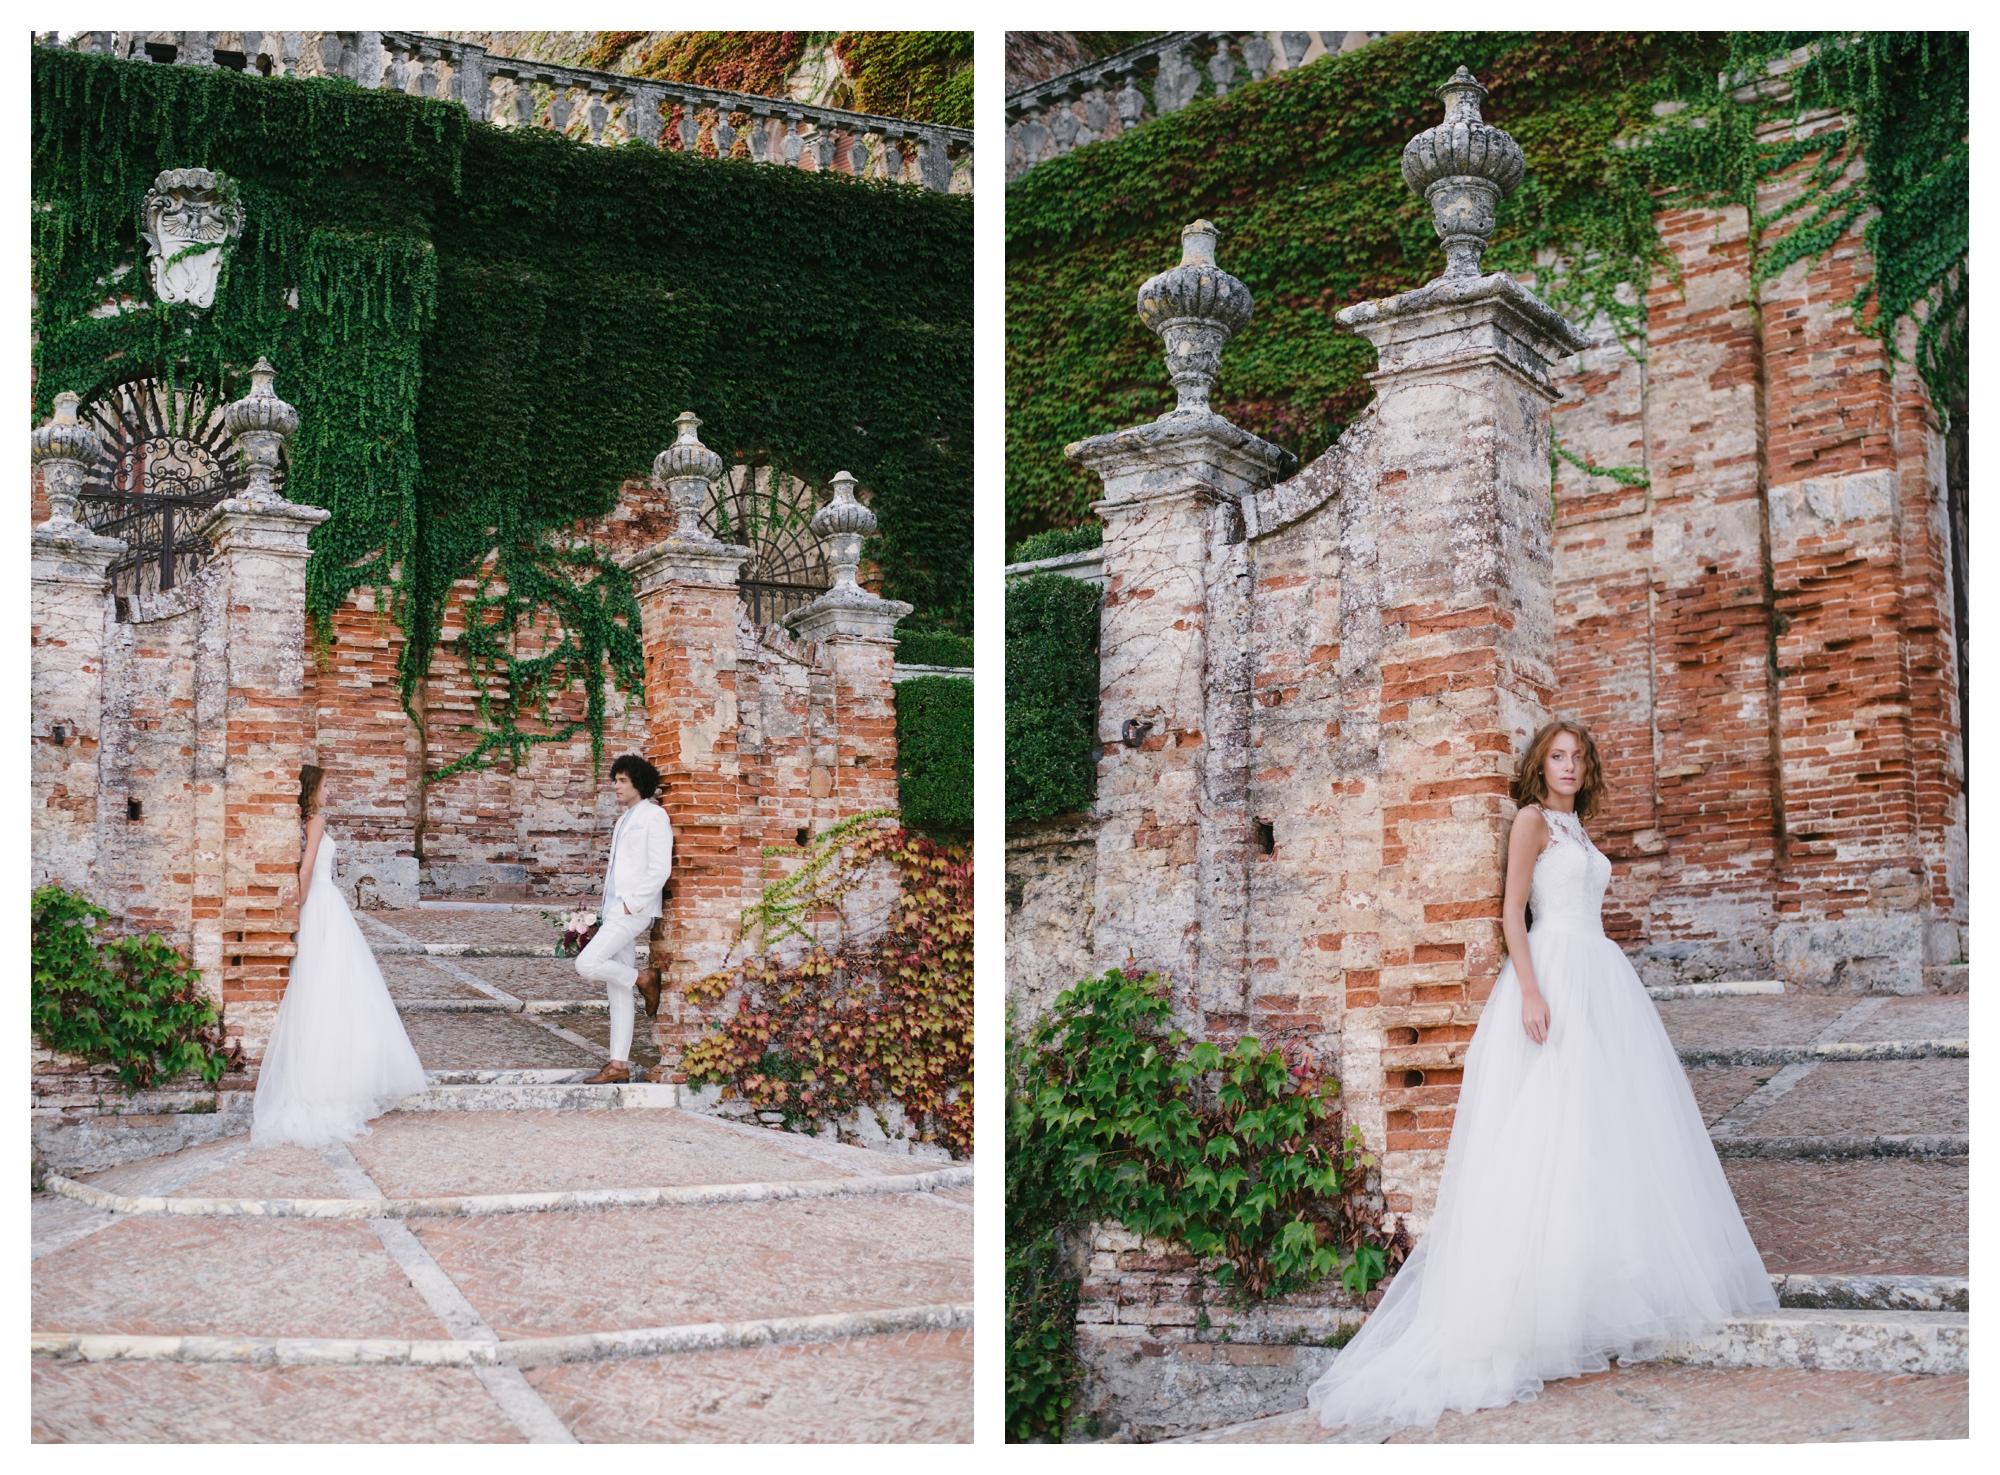 tuscany-castle-wedding-photographer-italy-williamsburgphotostudios-_0022.jpg